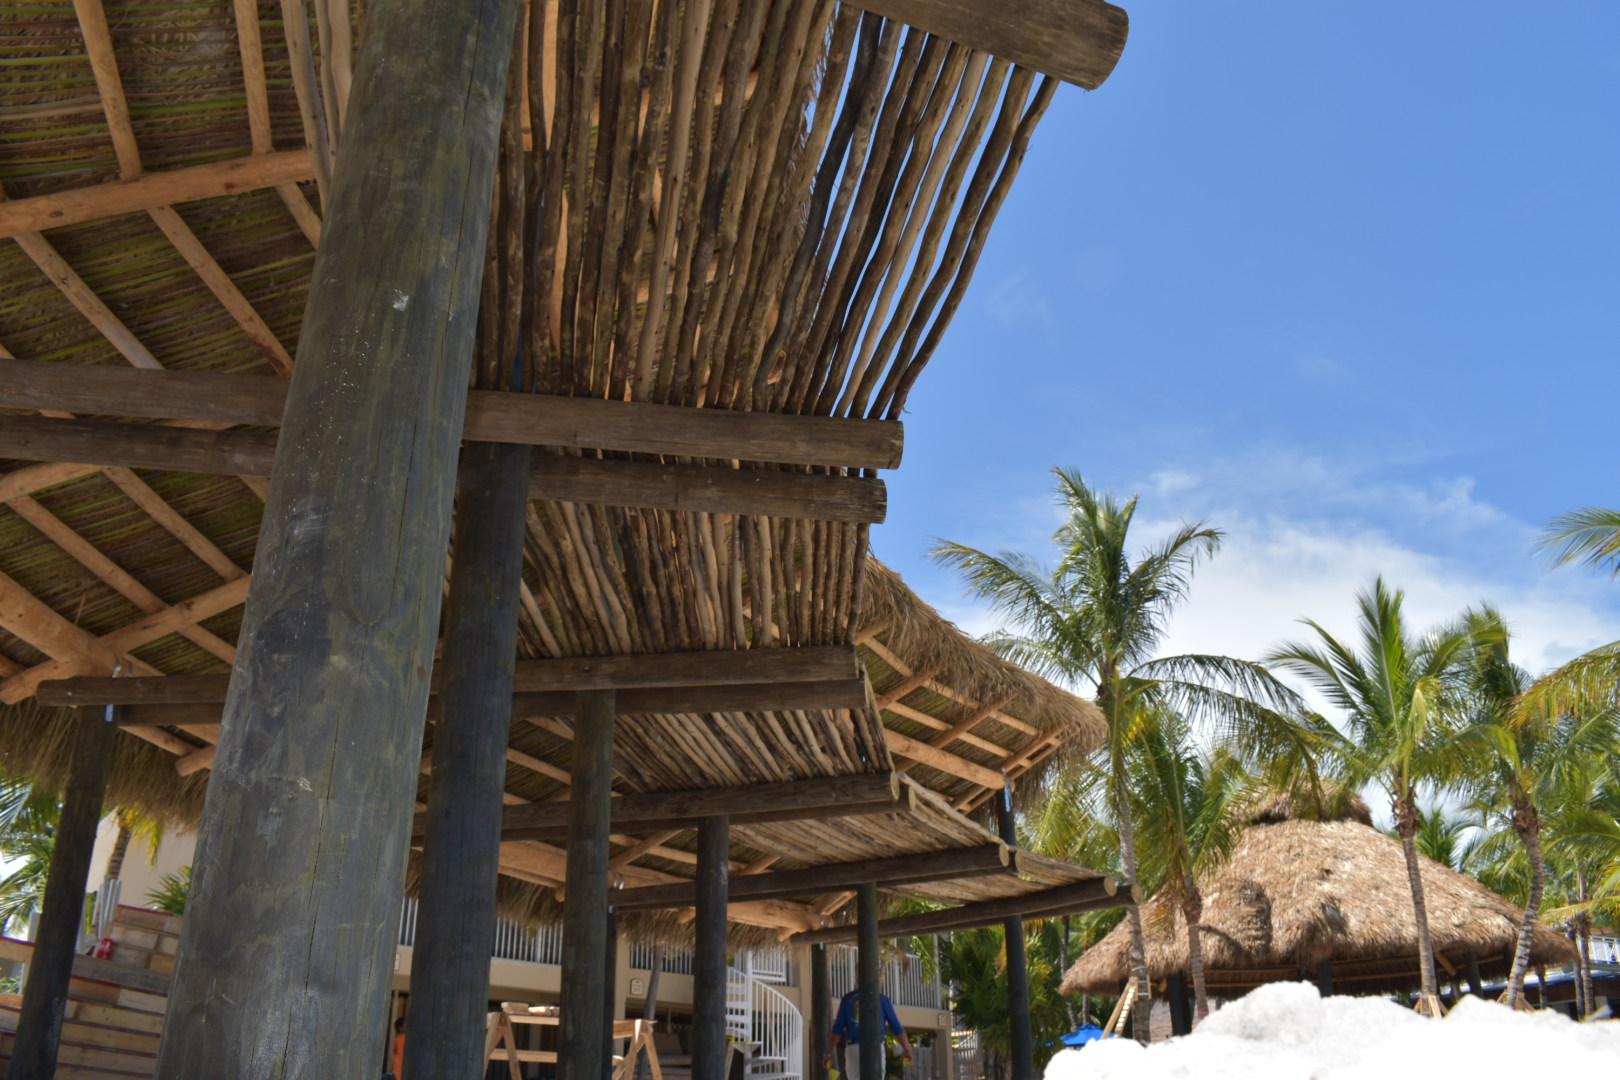 Cheeca Lodge Cabanas Islamorade Key, Fl